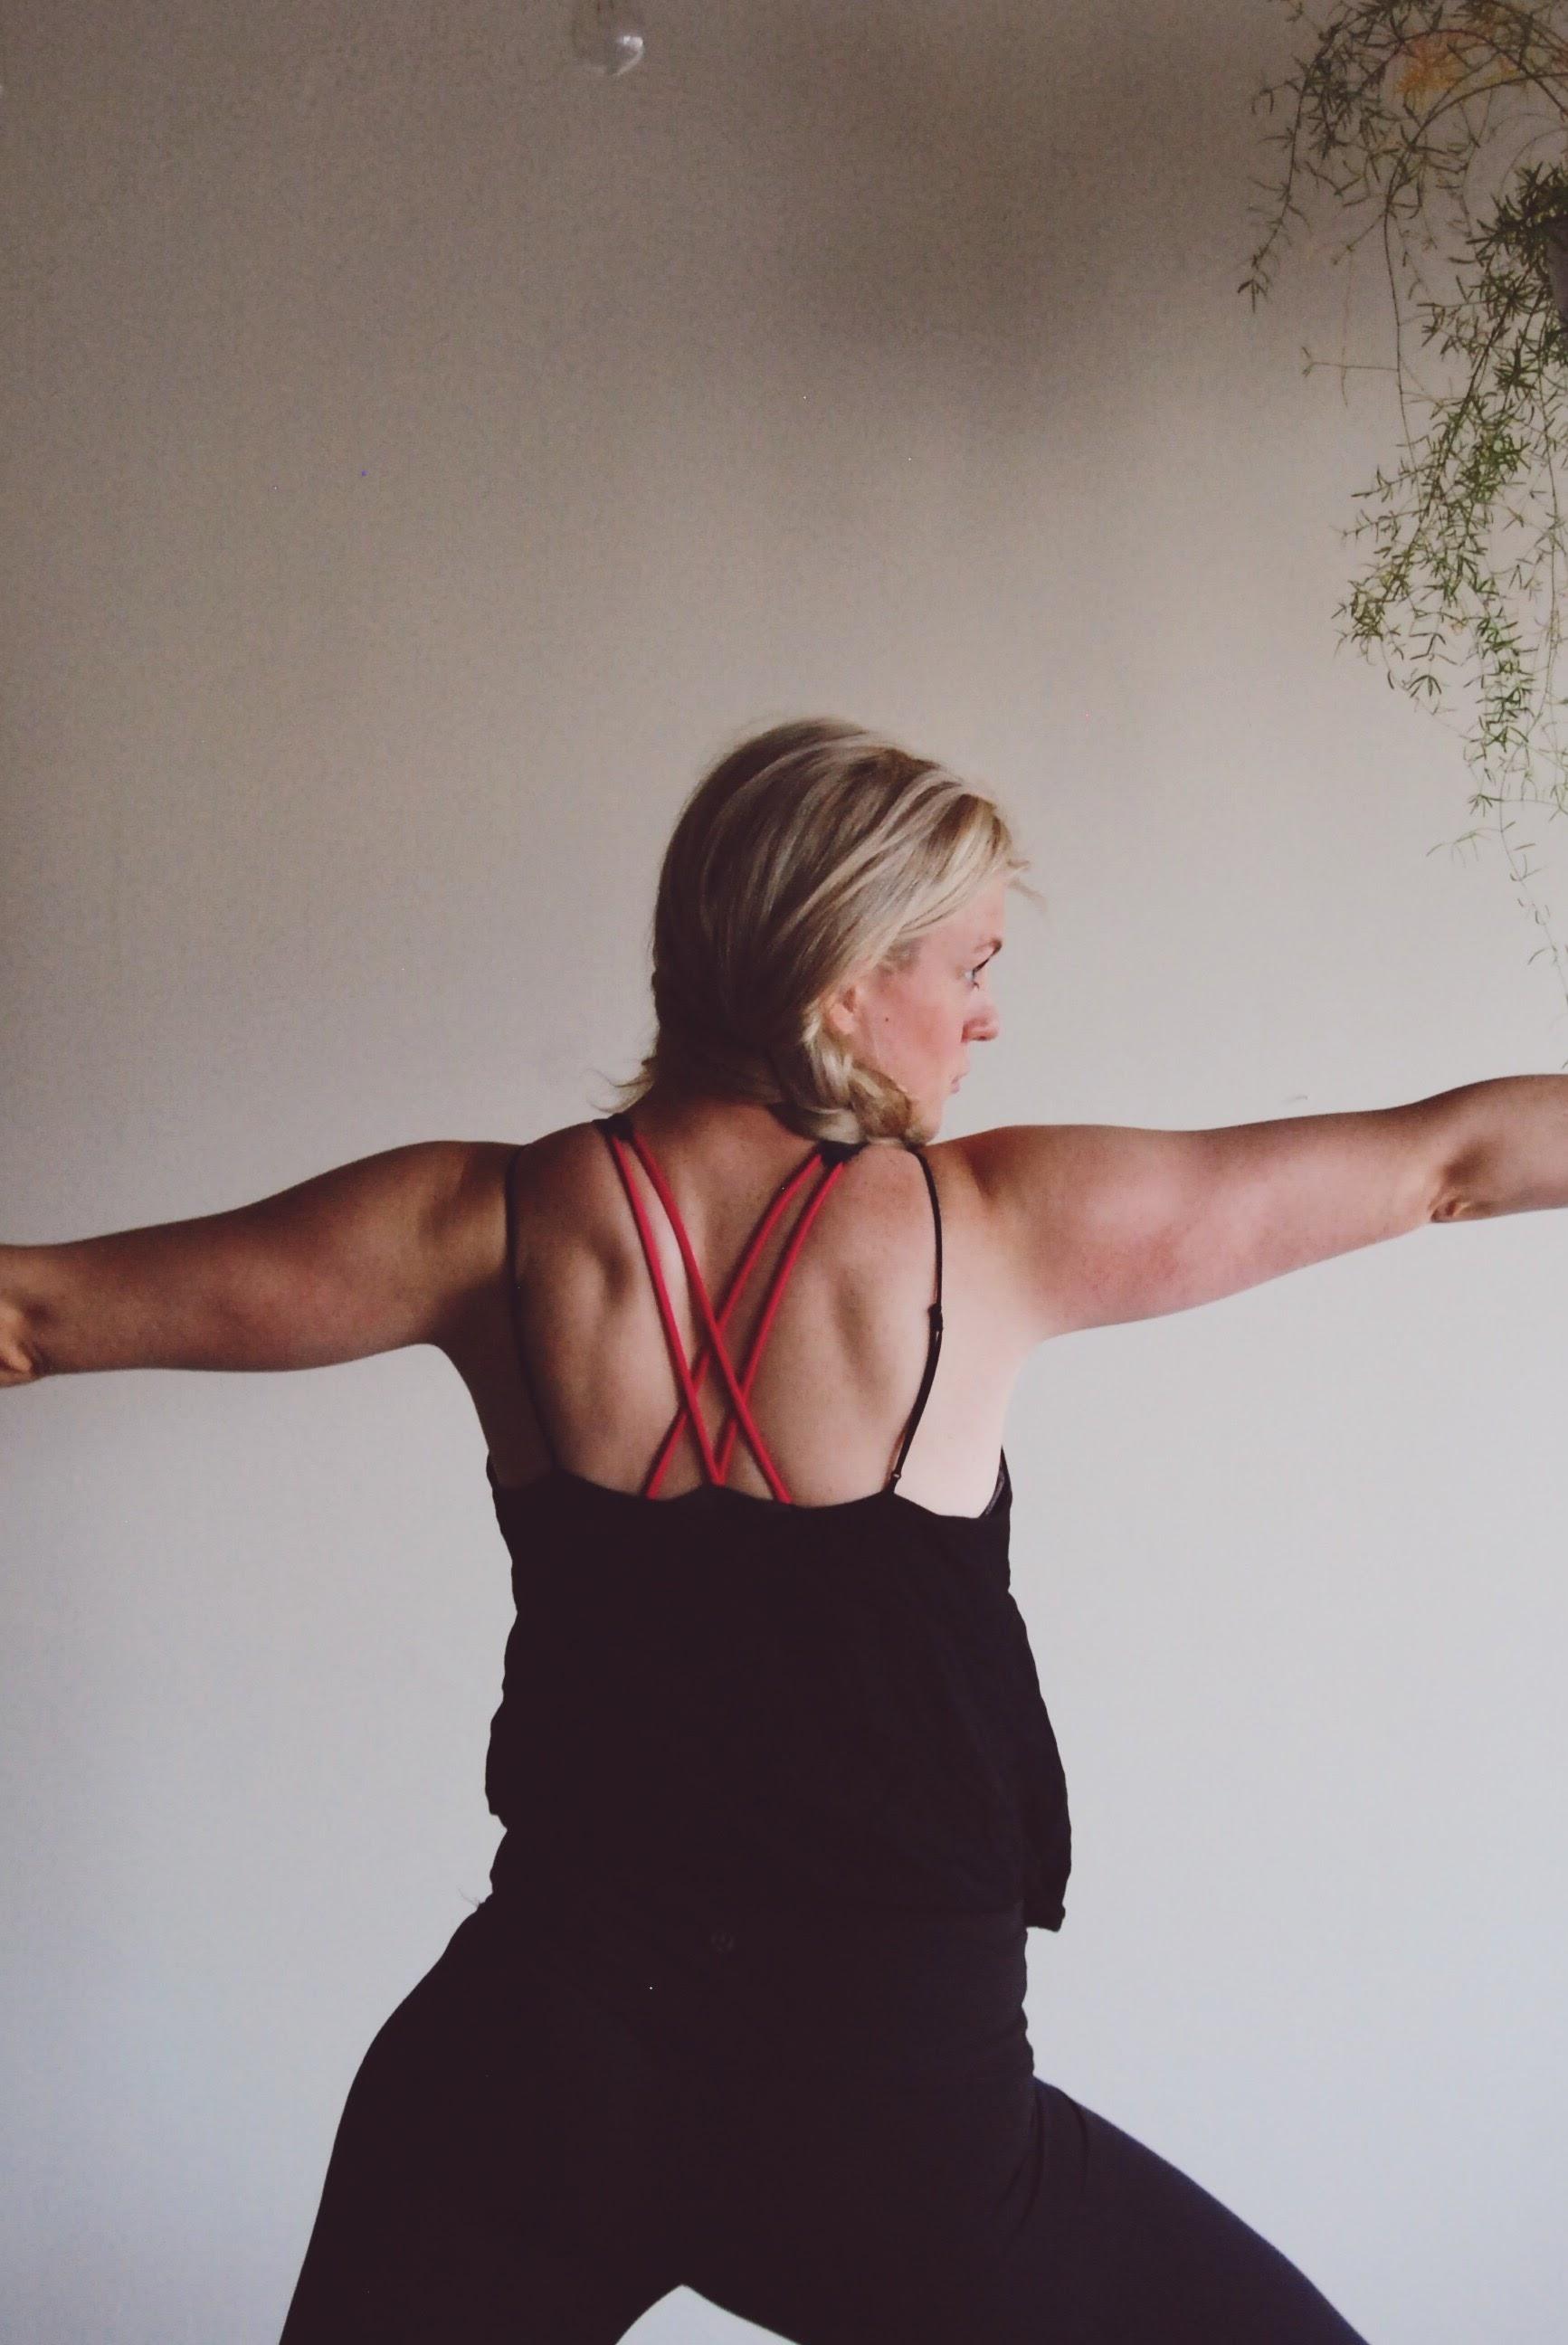 A Bit of a Stretch - My Yoga Challenge - Week 4